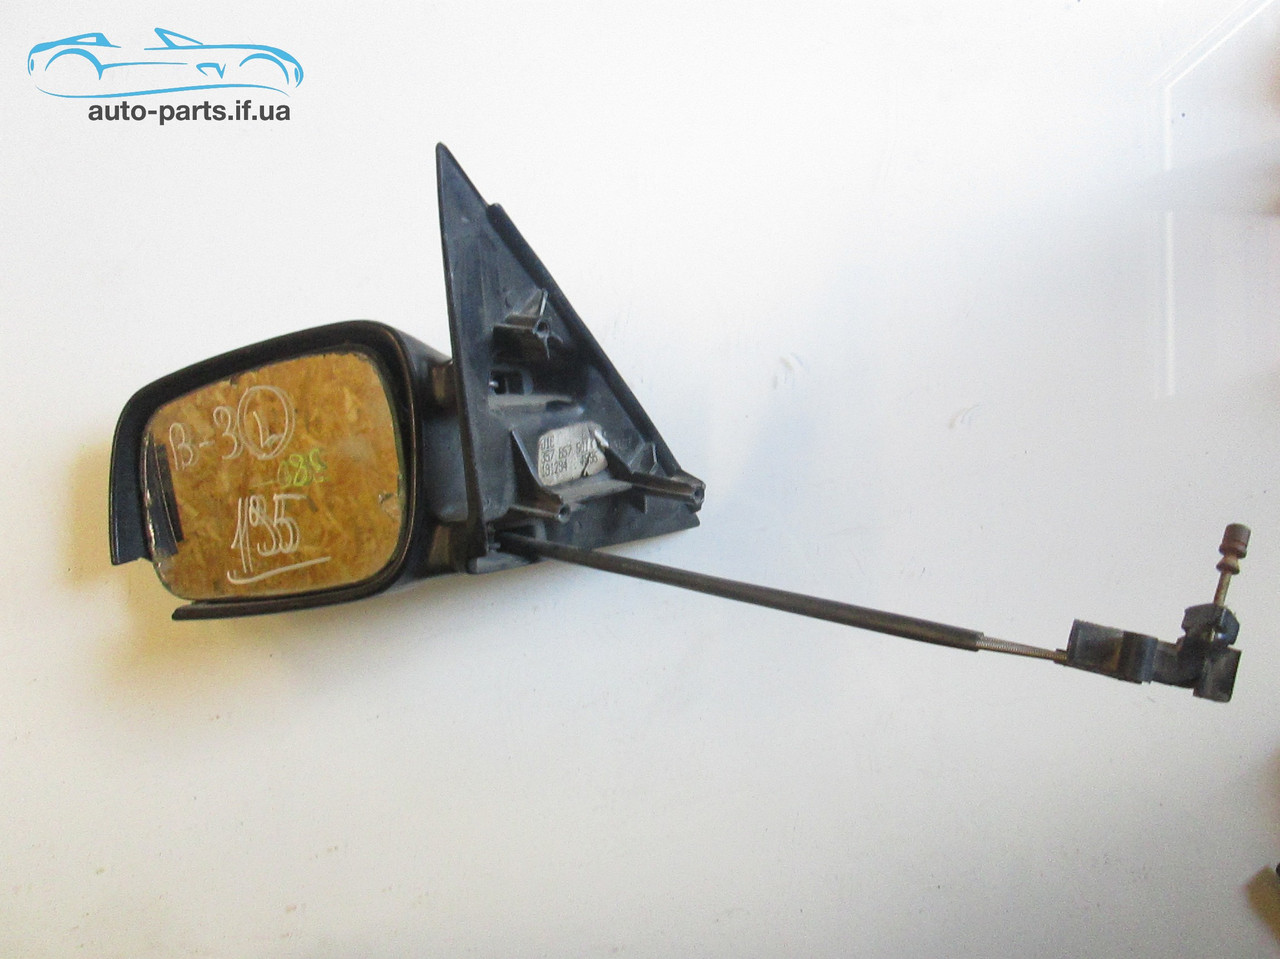 Зеркало левое Passat B3 №195